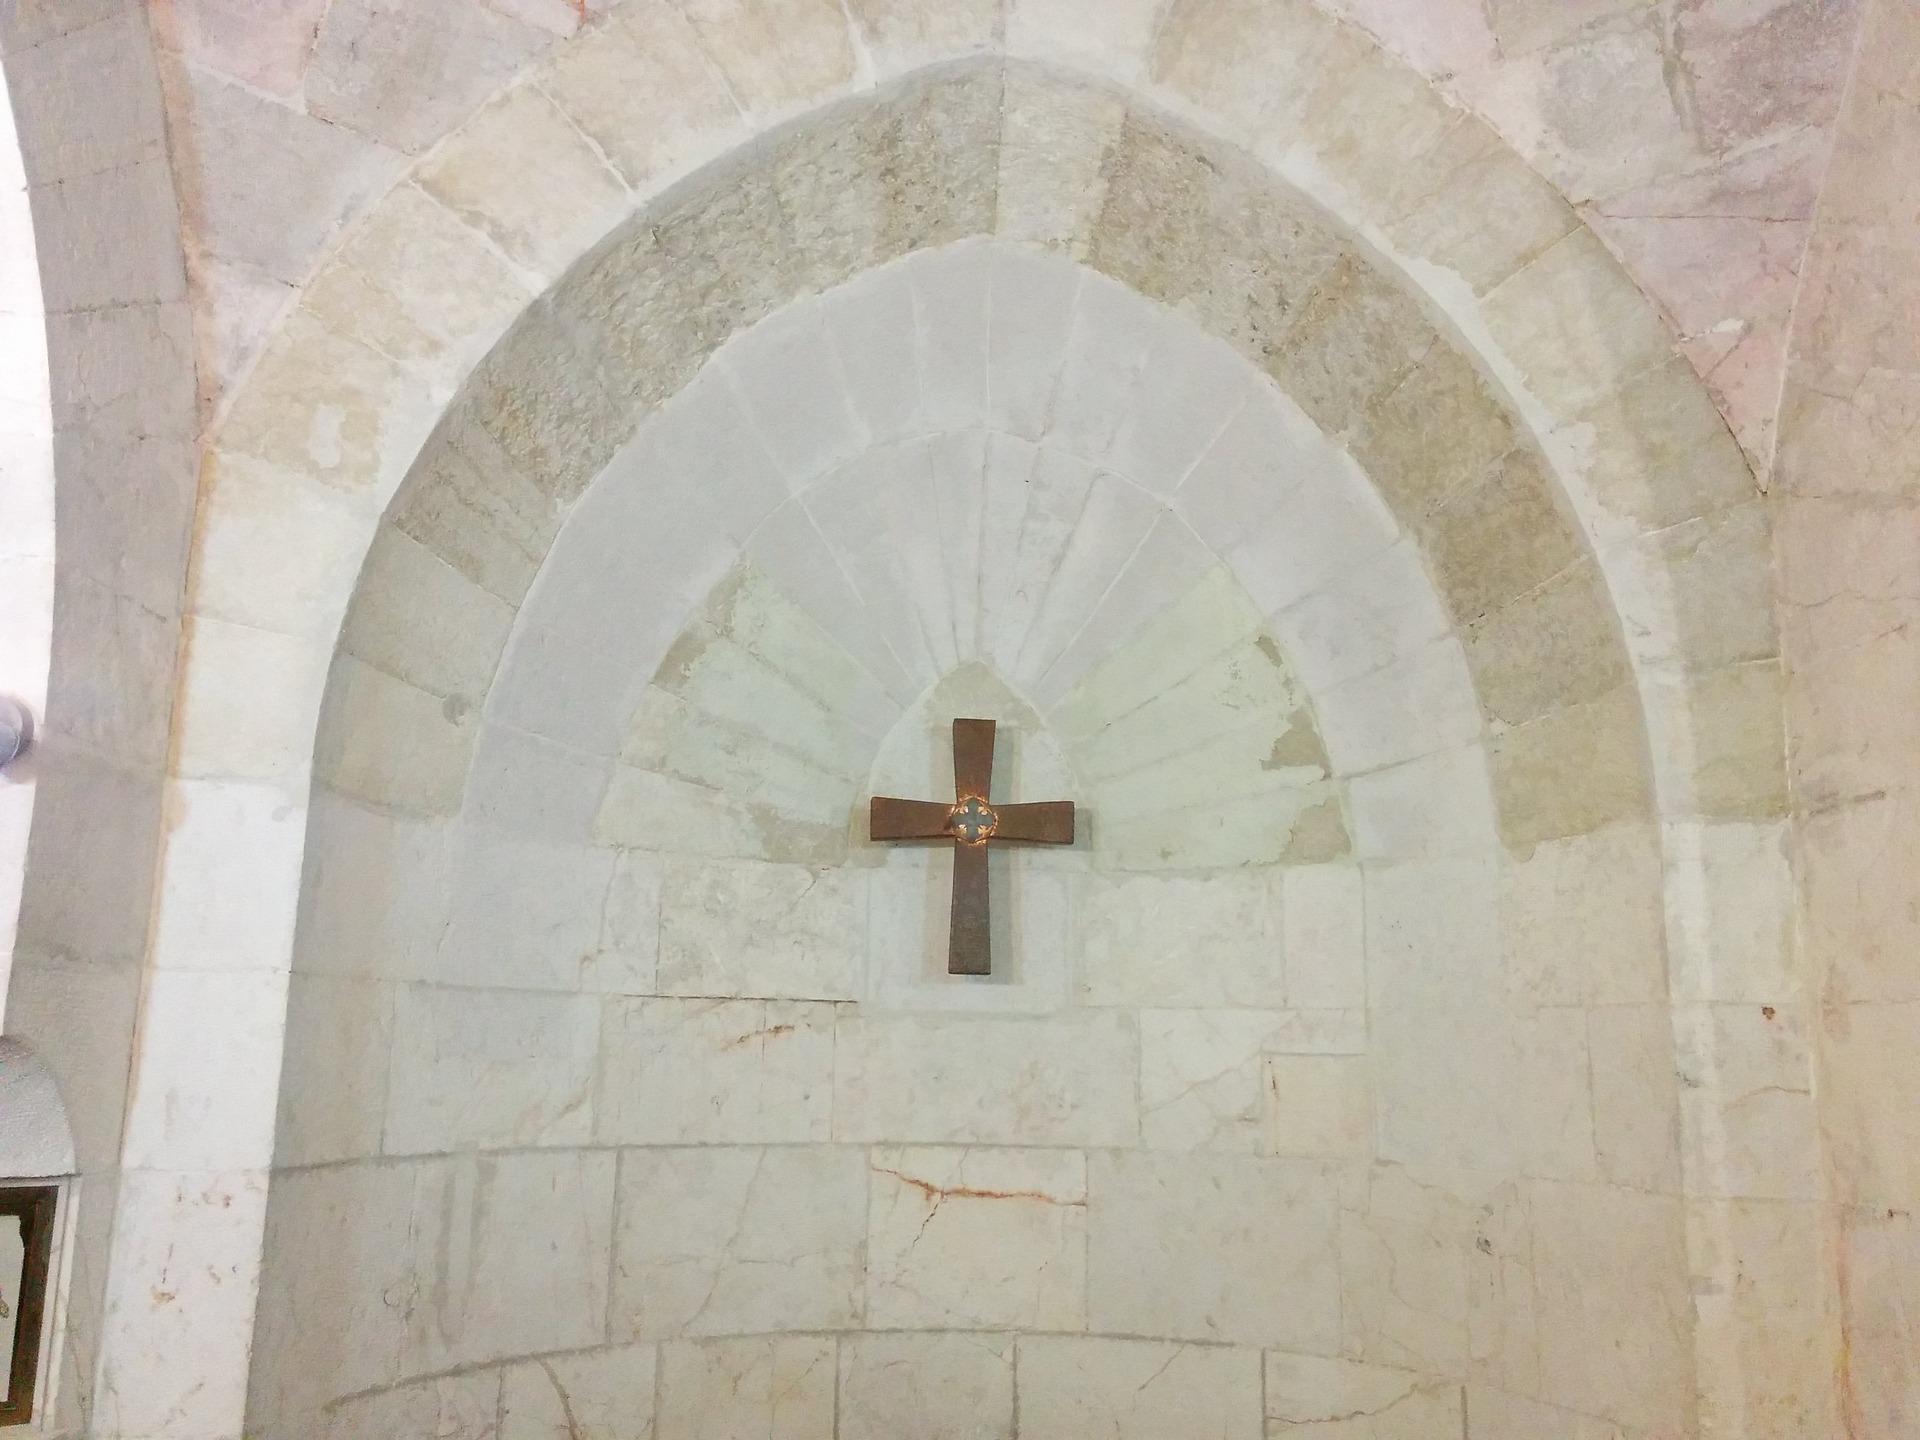 cross-holy-land-2262549_1920.jpg